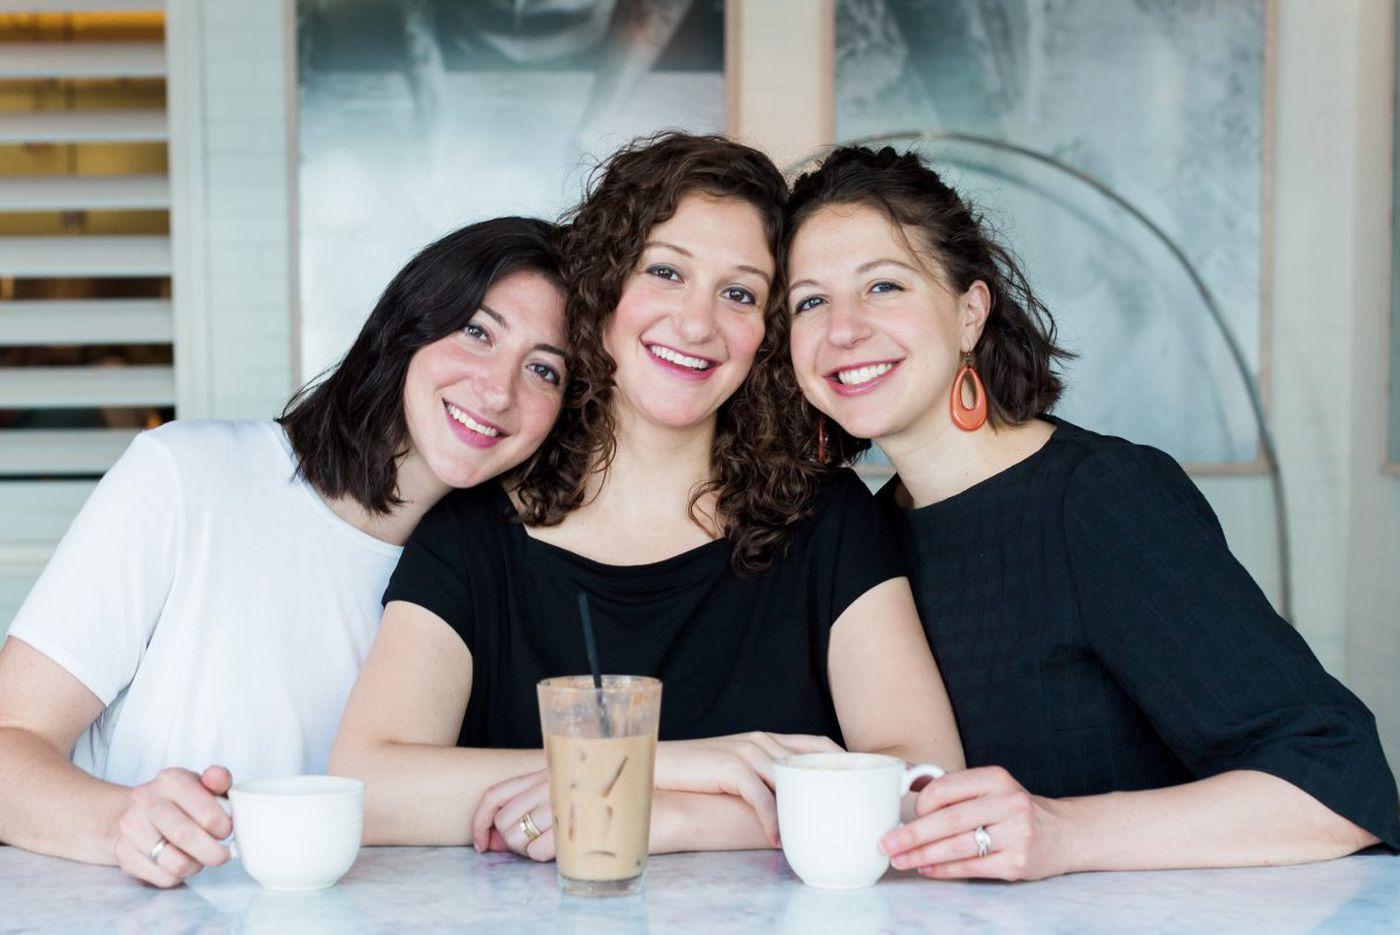 Meet the Philly women looking to take tahini beyond hummus